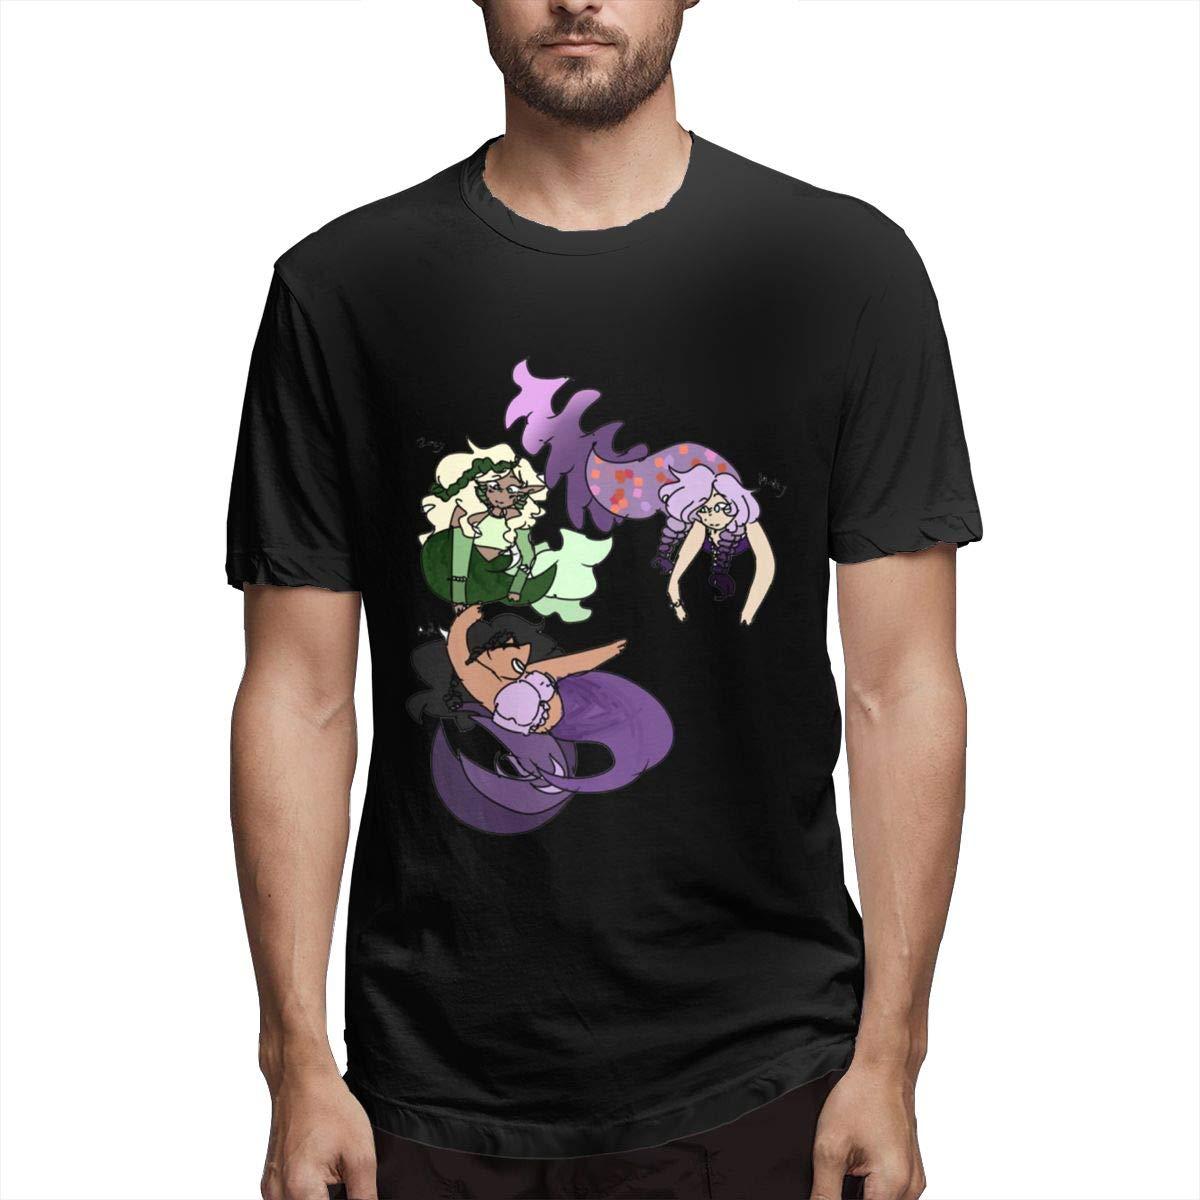 VIIHAHN Man Round Neck Short Sleeve T-Shirt Practical Aphmau Print 100/% Cotton T-Shirts